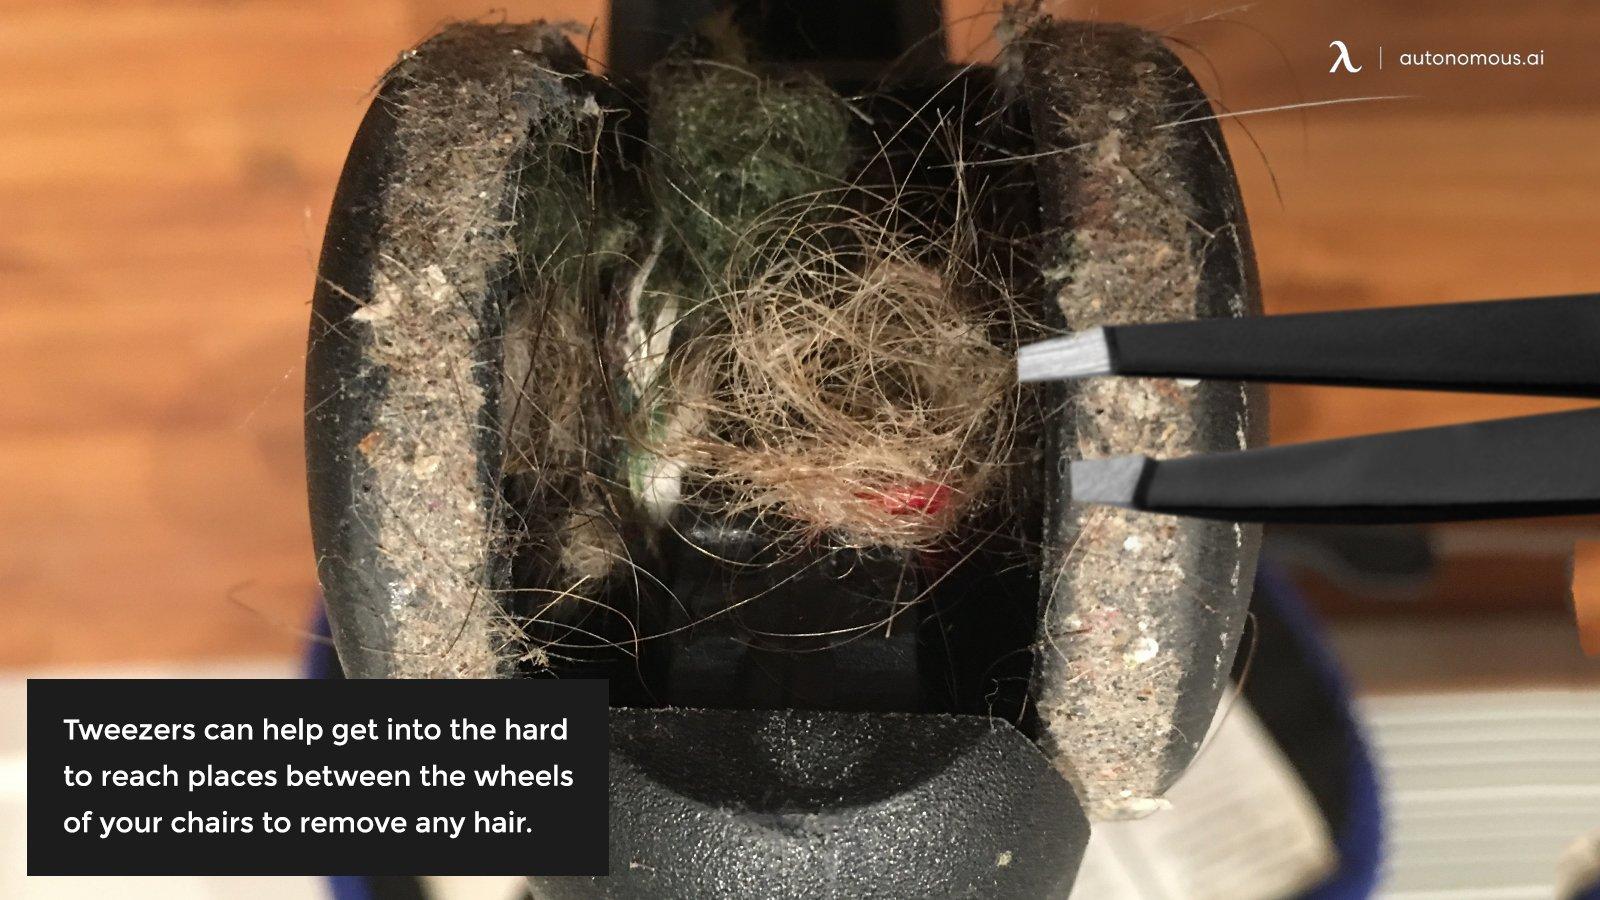 Using tweezers to remove hair